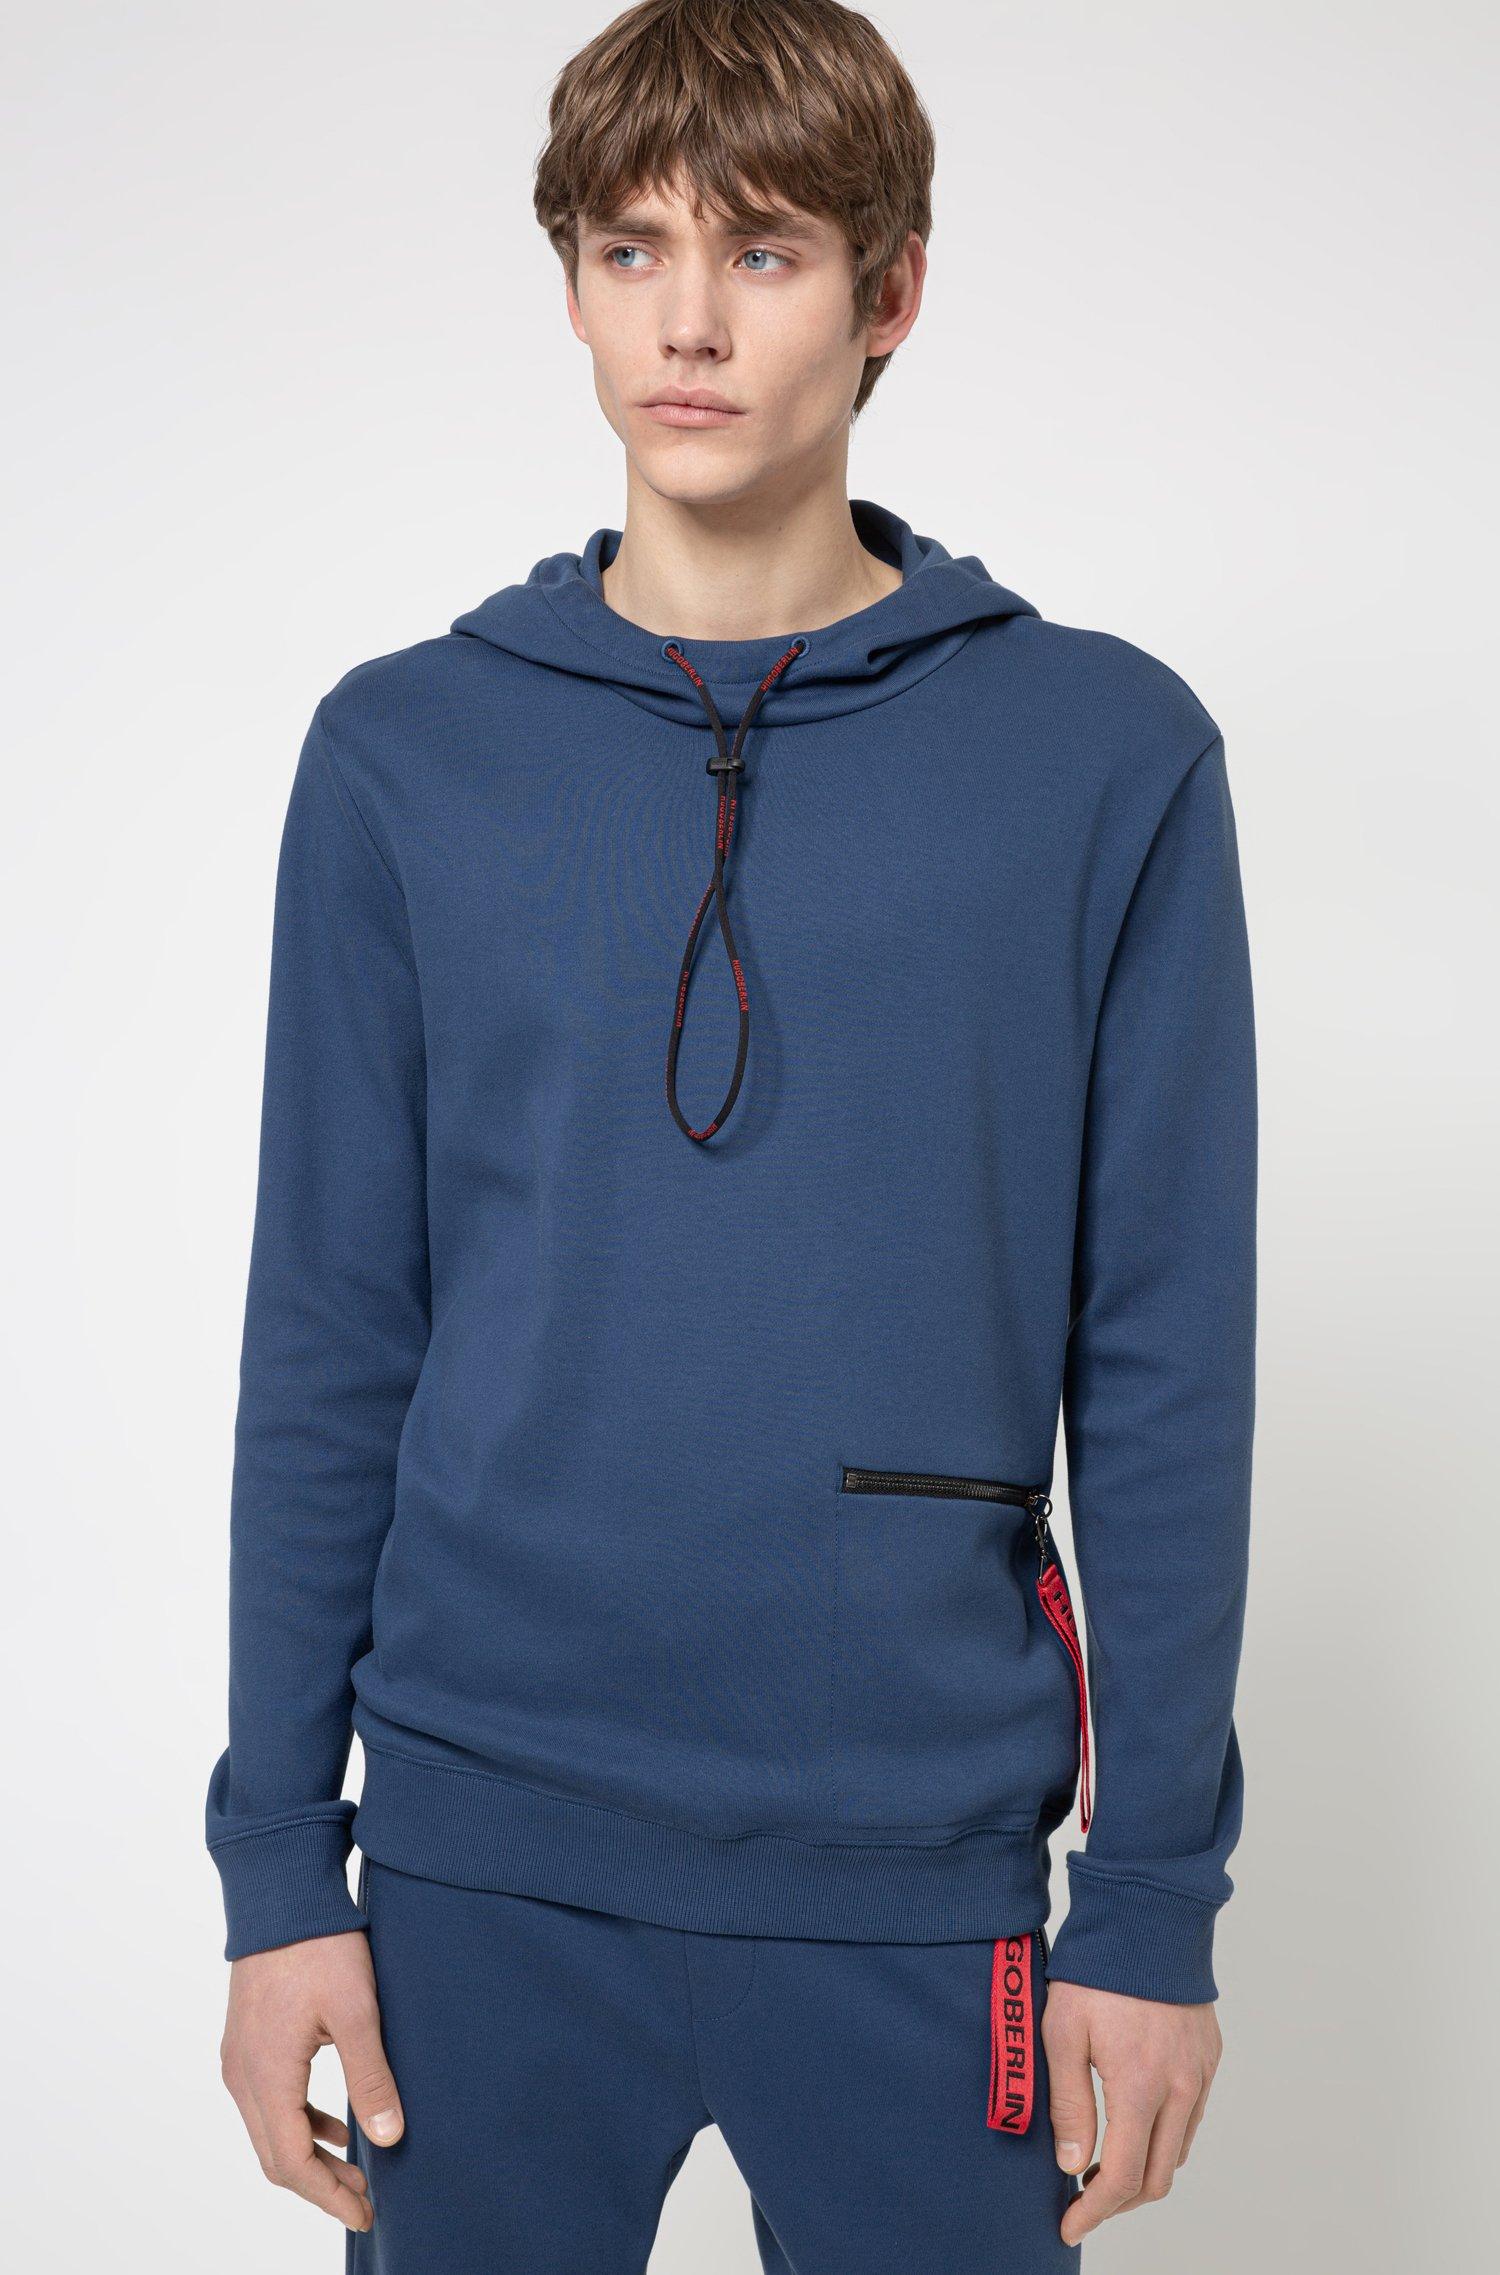 Interlock-cotton hooded sweatshirt with zipped pocket, Dark Blue